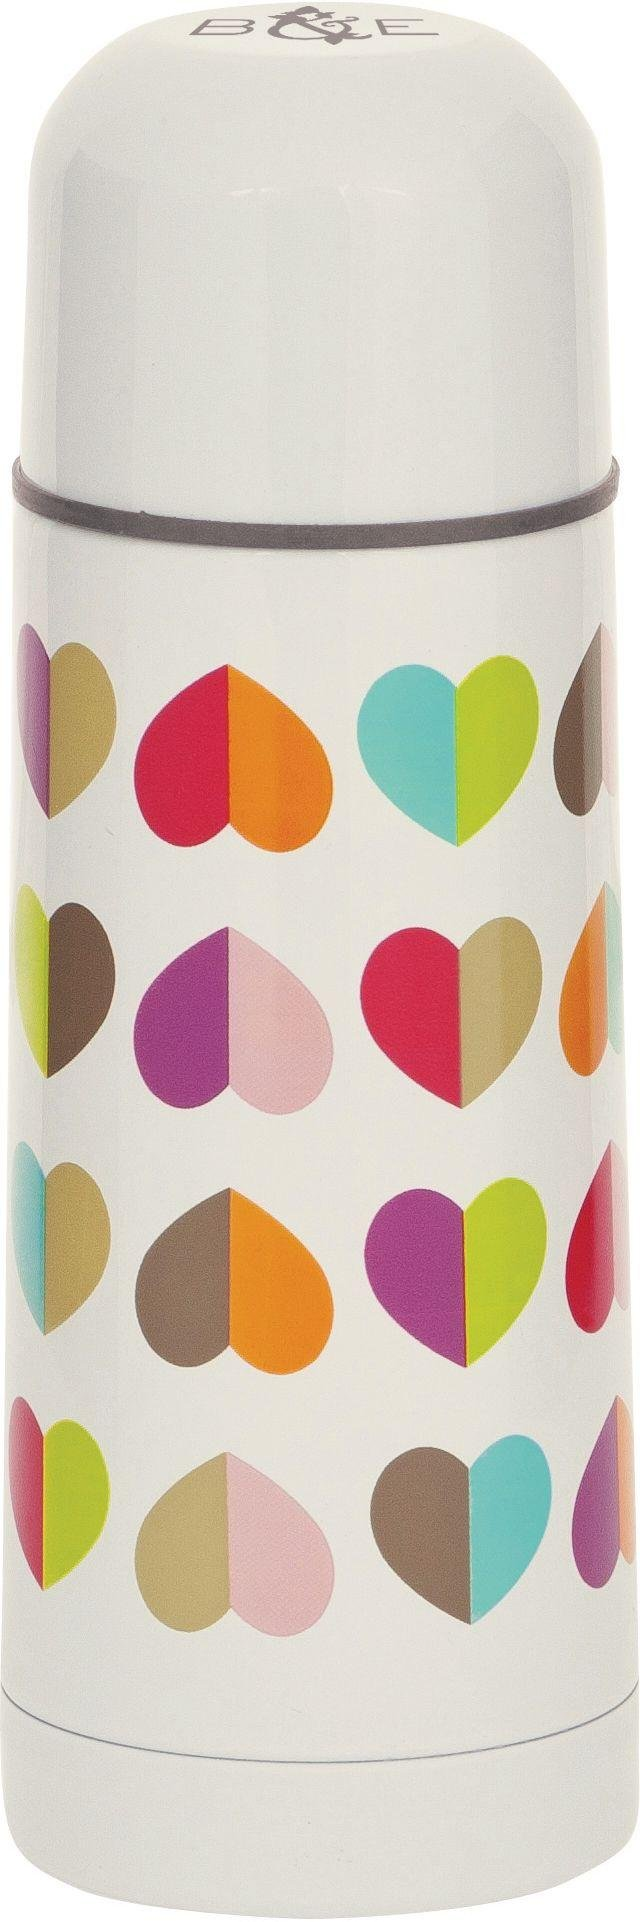 Image of Beau and Elliot - Confetti 350ml Vacuum Flask- Multicoloured